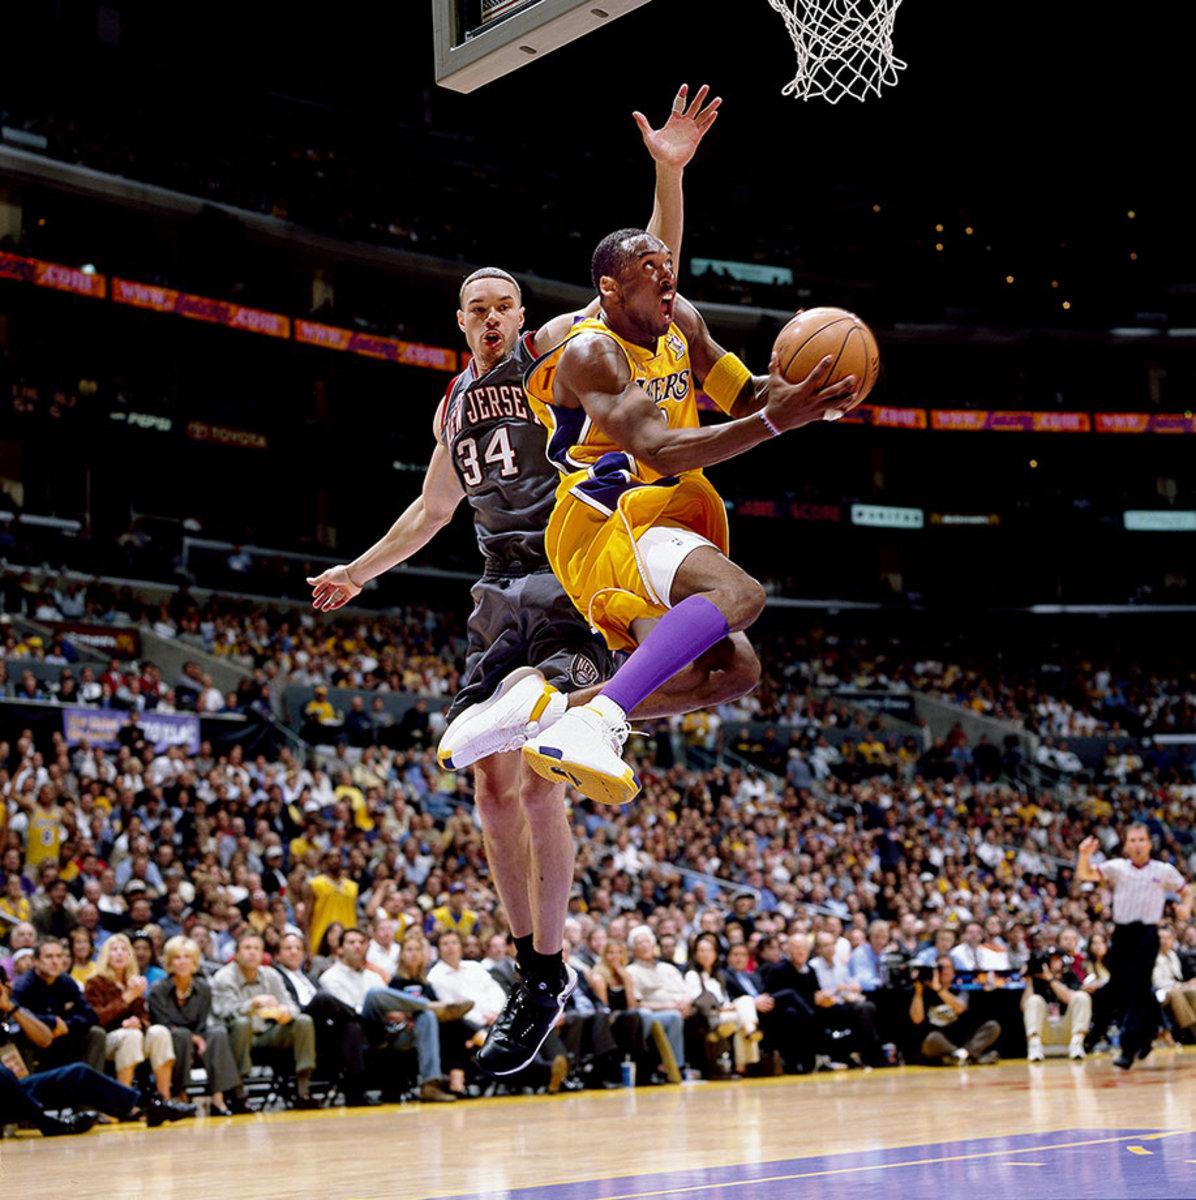 2002-0605-Kobe-Bryant-Aaron-Williams-079117343.jpg